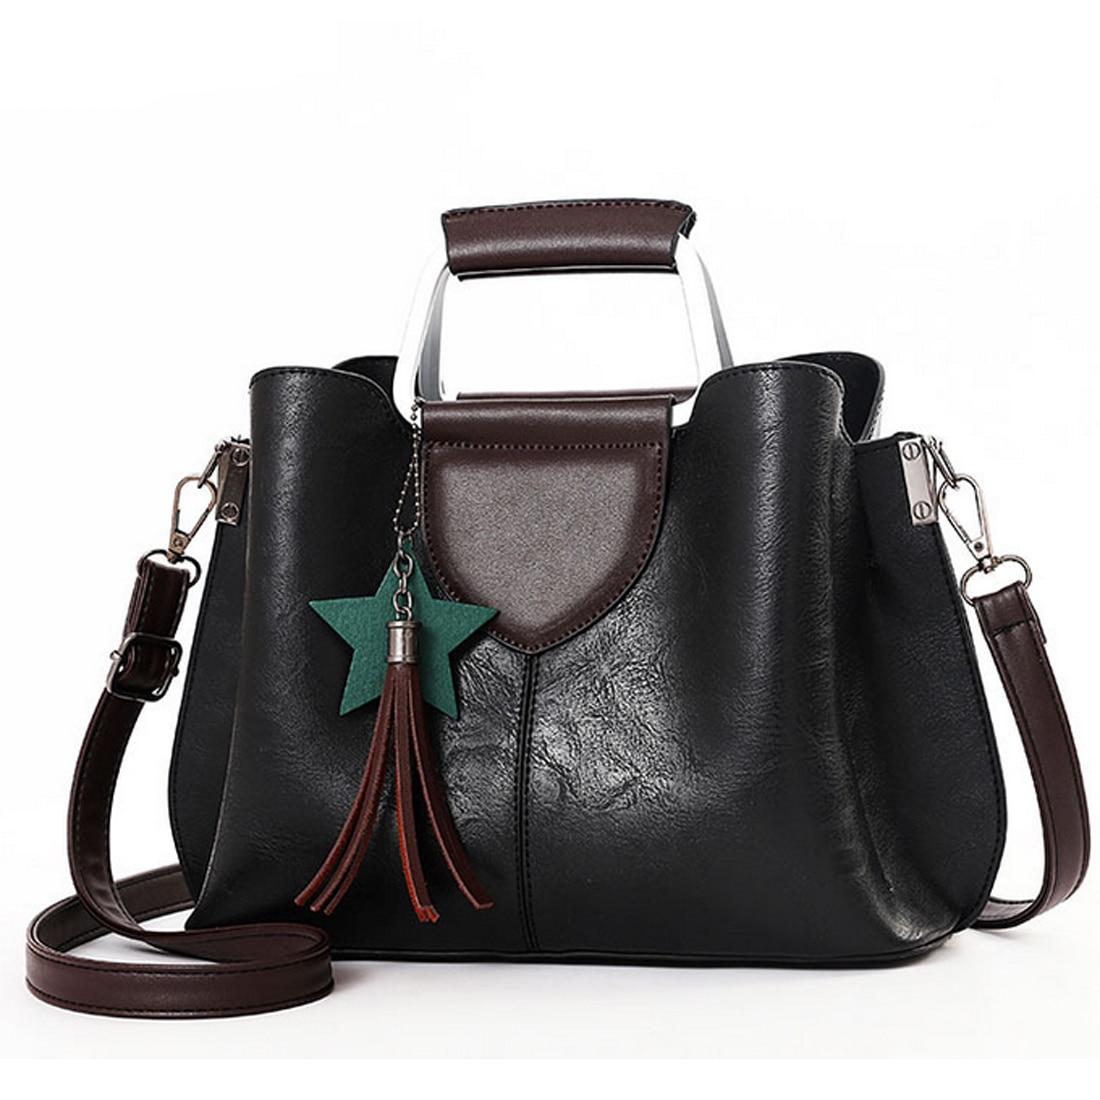 2017 Luxury Brand women handbags designer patchwork tassel ladies